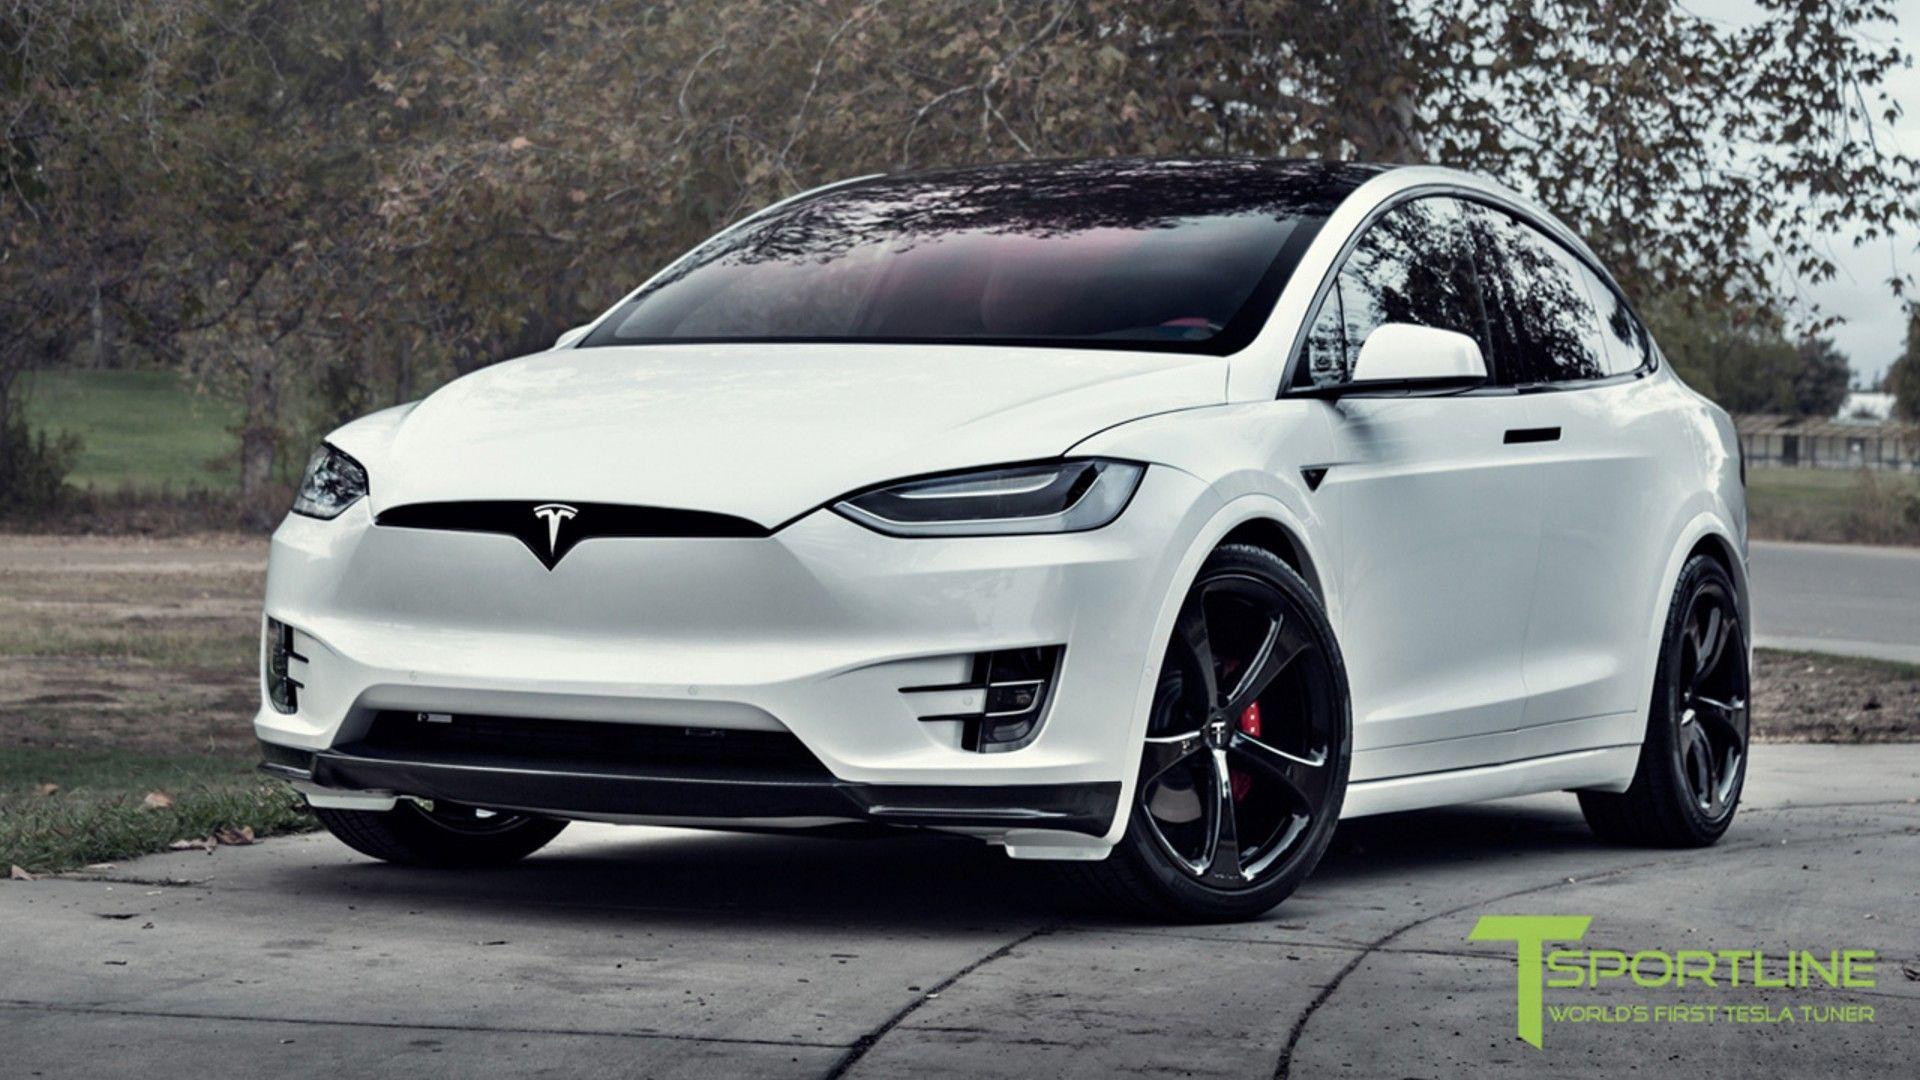 Tesla model x for sale ebay